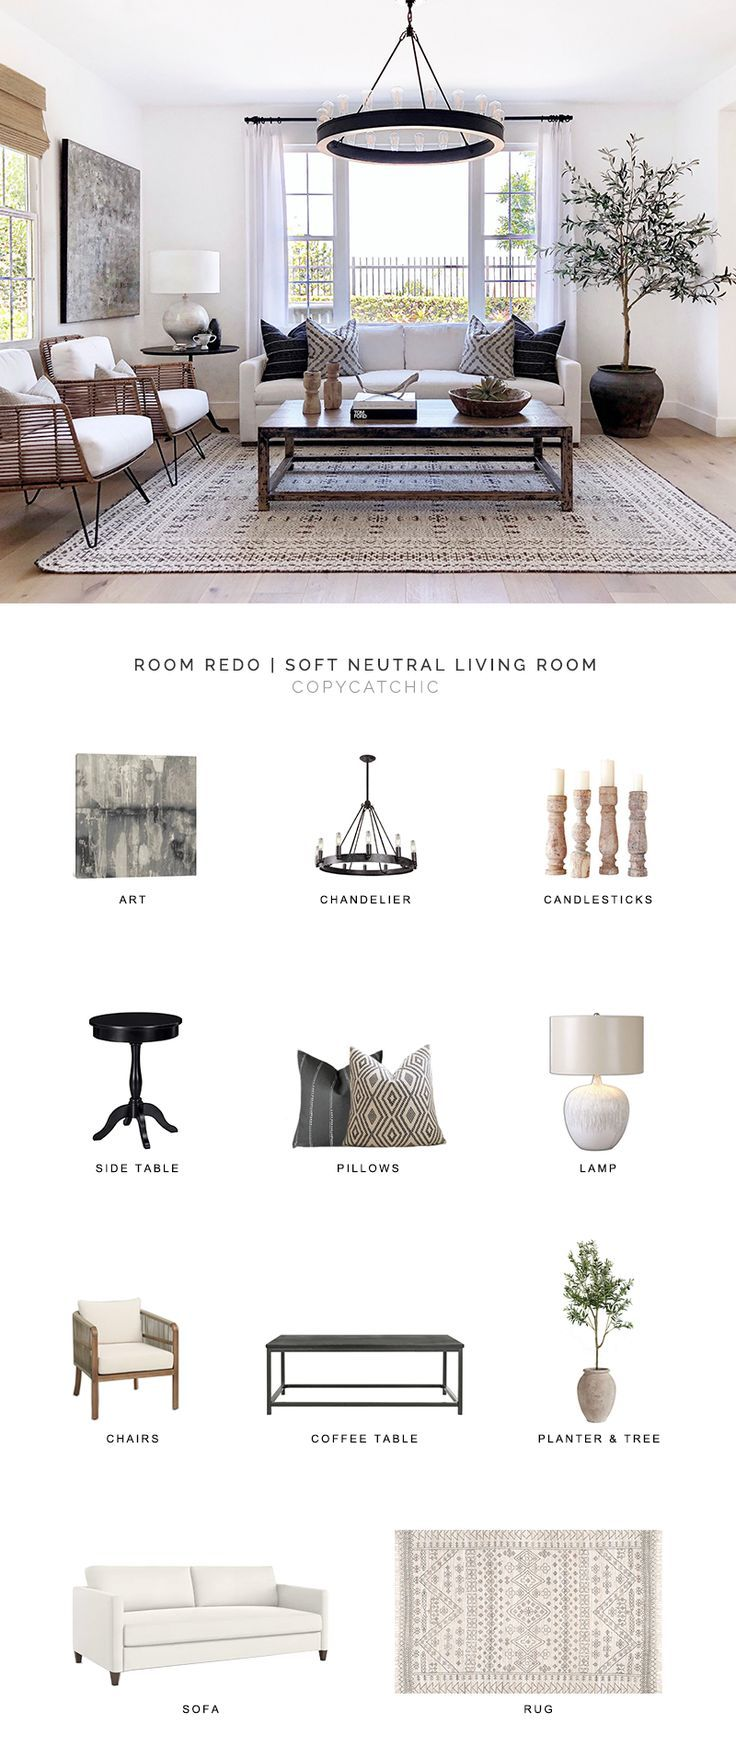 Room Redo | Soft Neutral Living Room - copycatchic